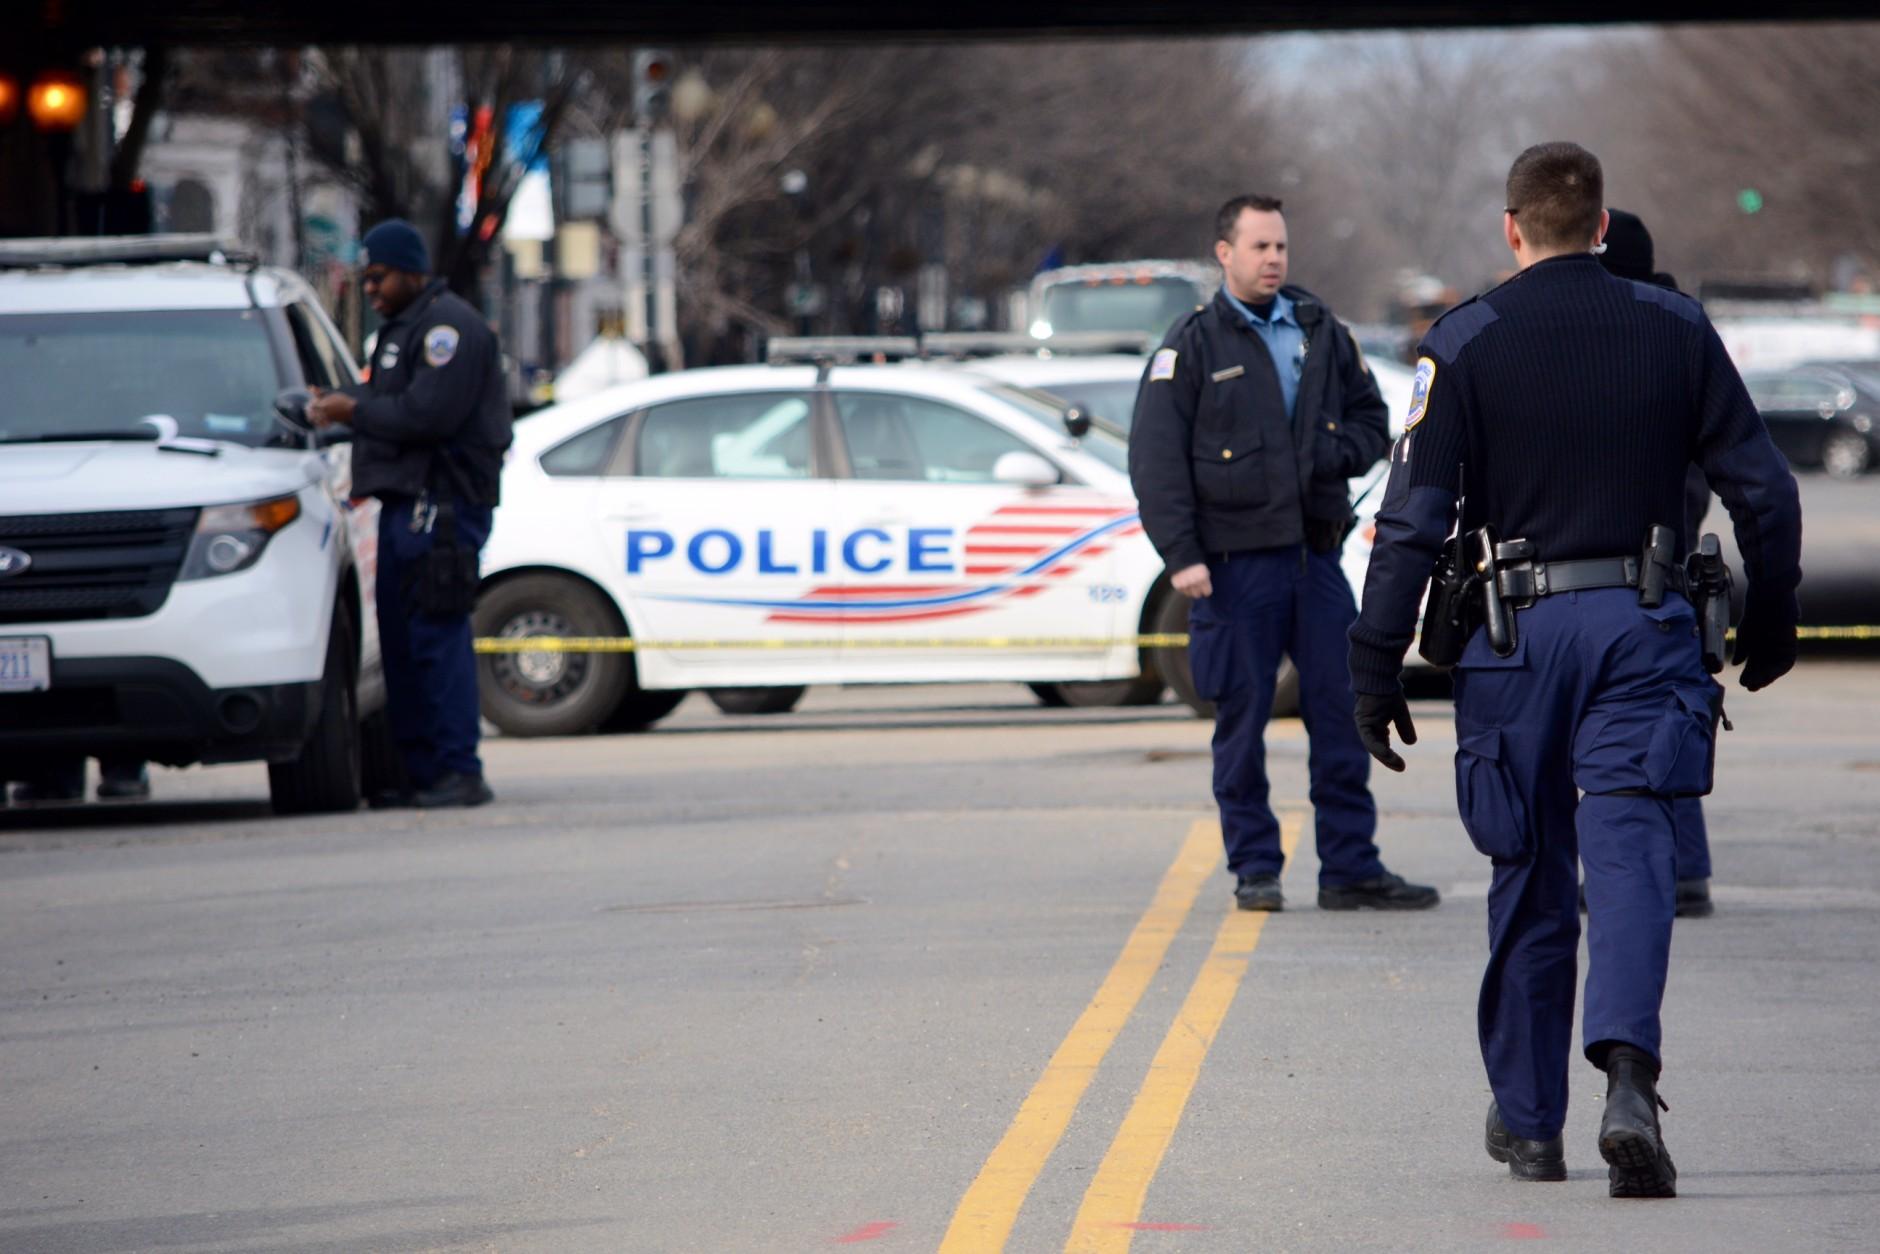 D.C. Police on the scene of a double shooting near the Washington Navy Yard. (WTOP/Dave Dildine)